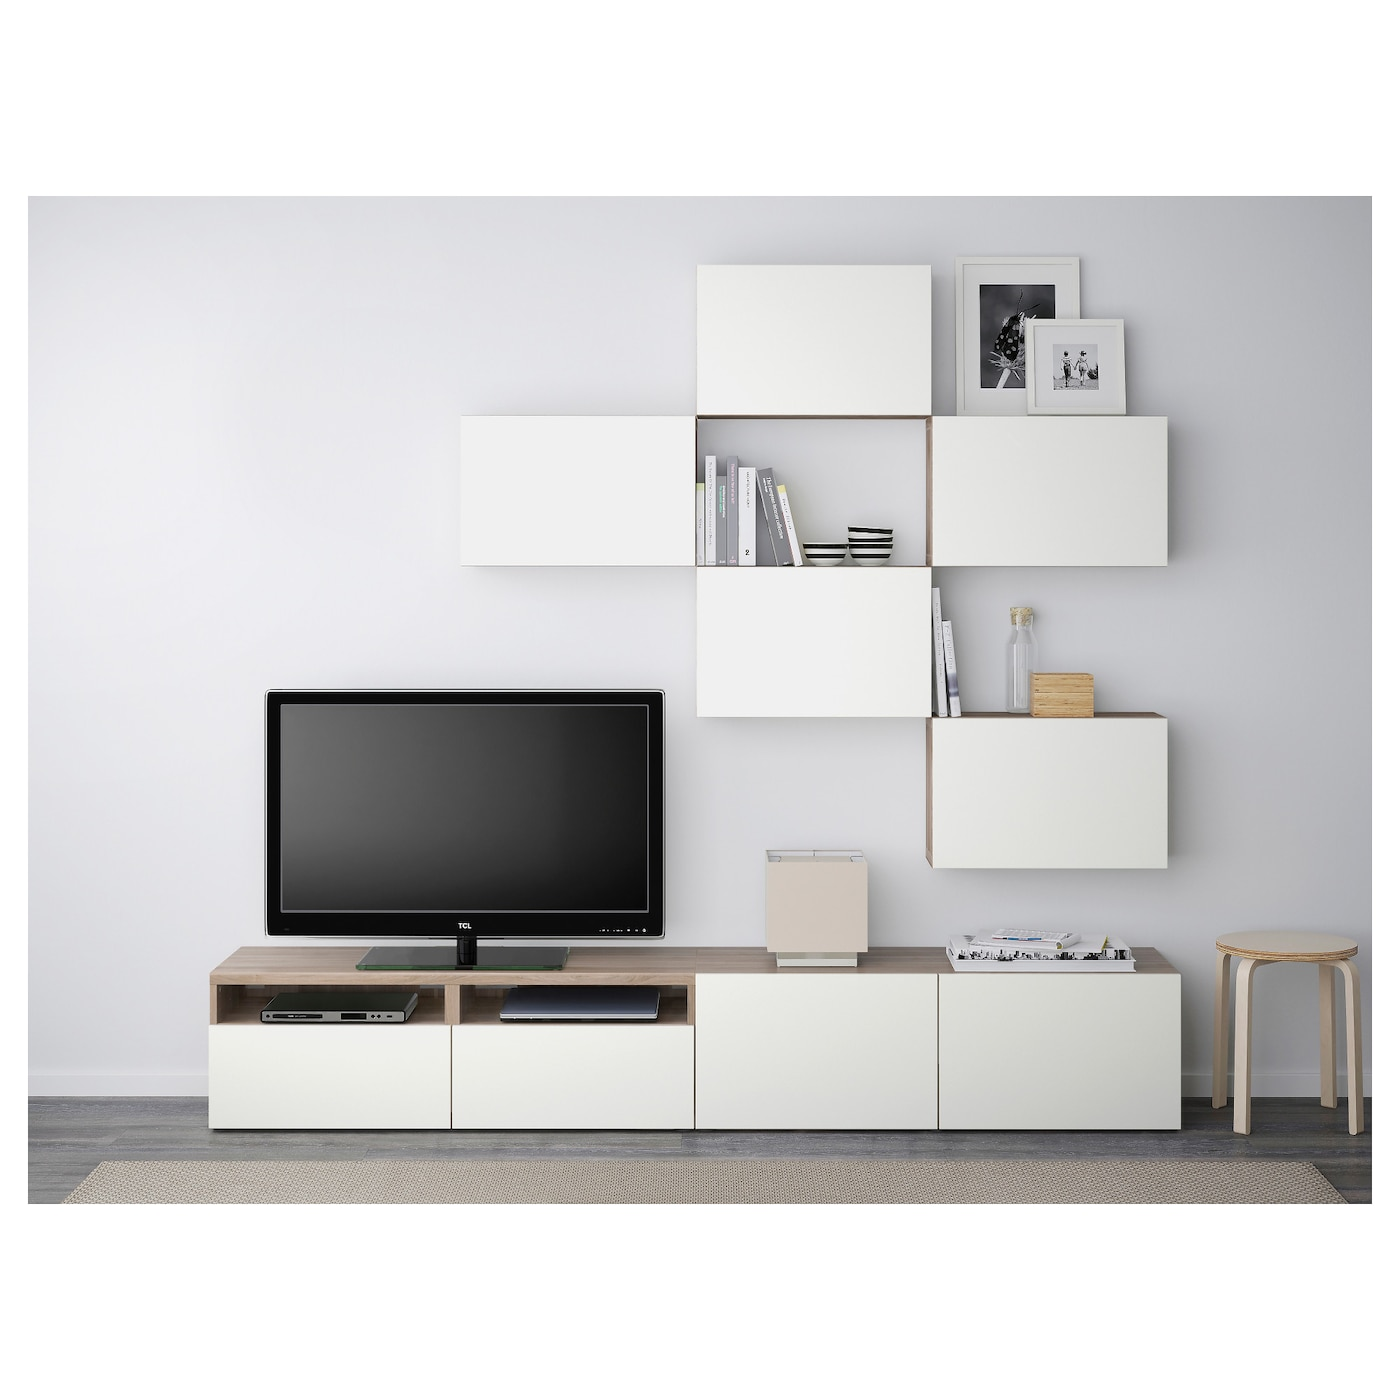 best combinaison meuble tv motif noyer teint gris lappviken blanc 240 x 20 40 x 204 cm ikea. Black Bedroom Furniture Sets. Home Design Ideas